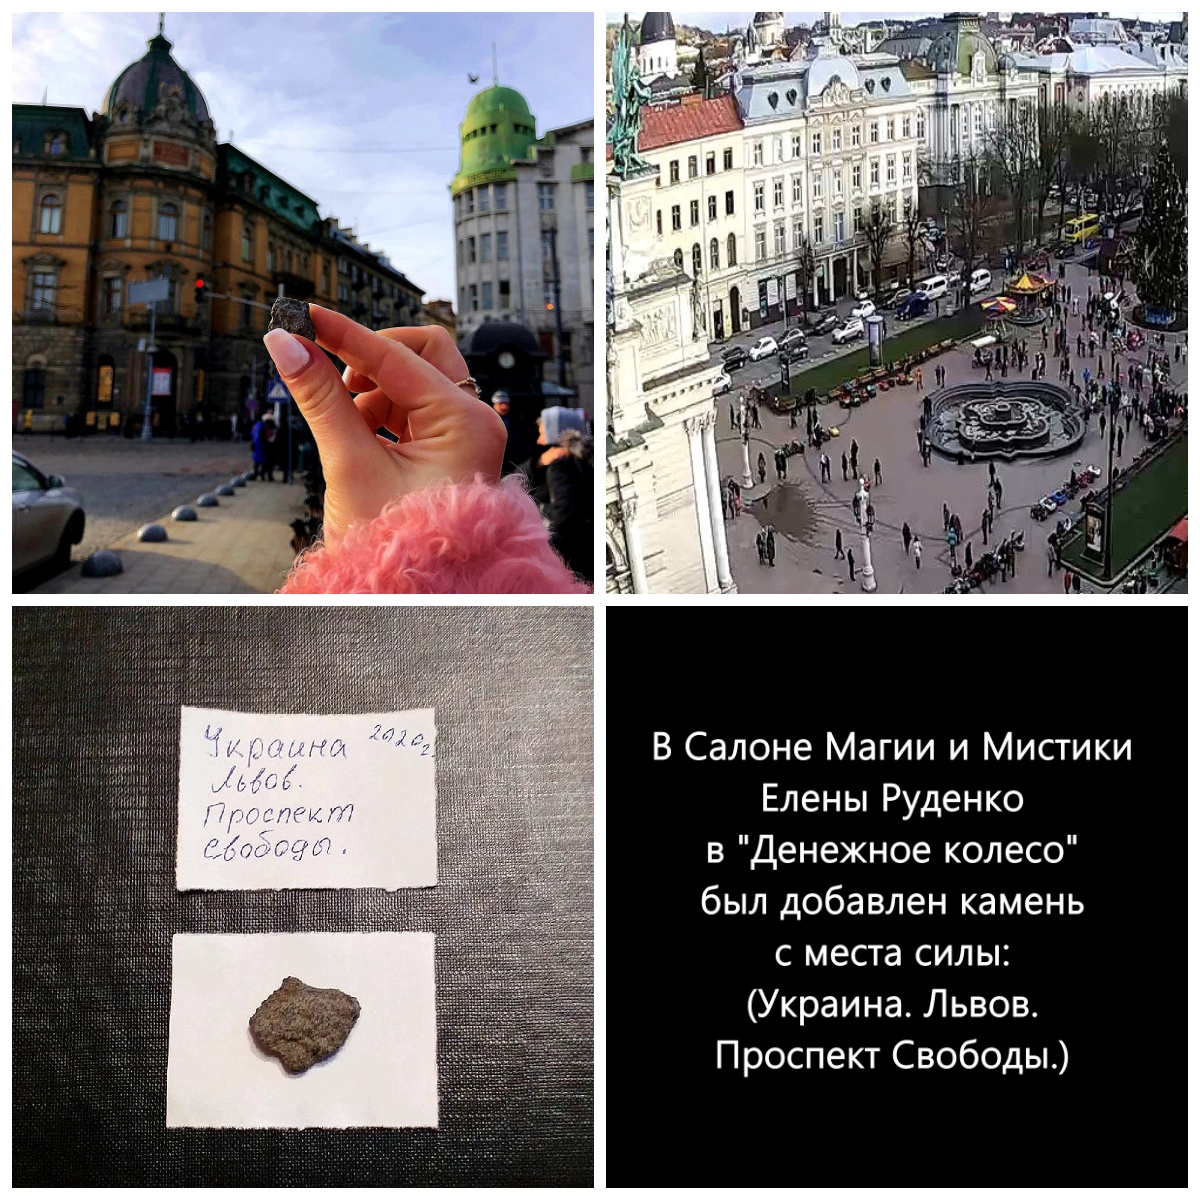 Хештег 666 на   Салон Магии и мистики Елены Руденко ( Валтеи ). Киев ,тел: 0506251562  D23ScY_xByQ